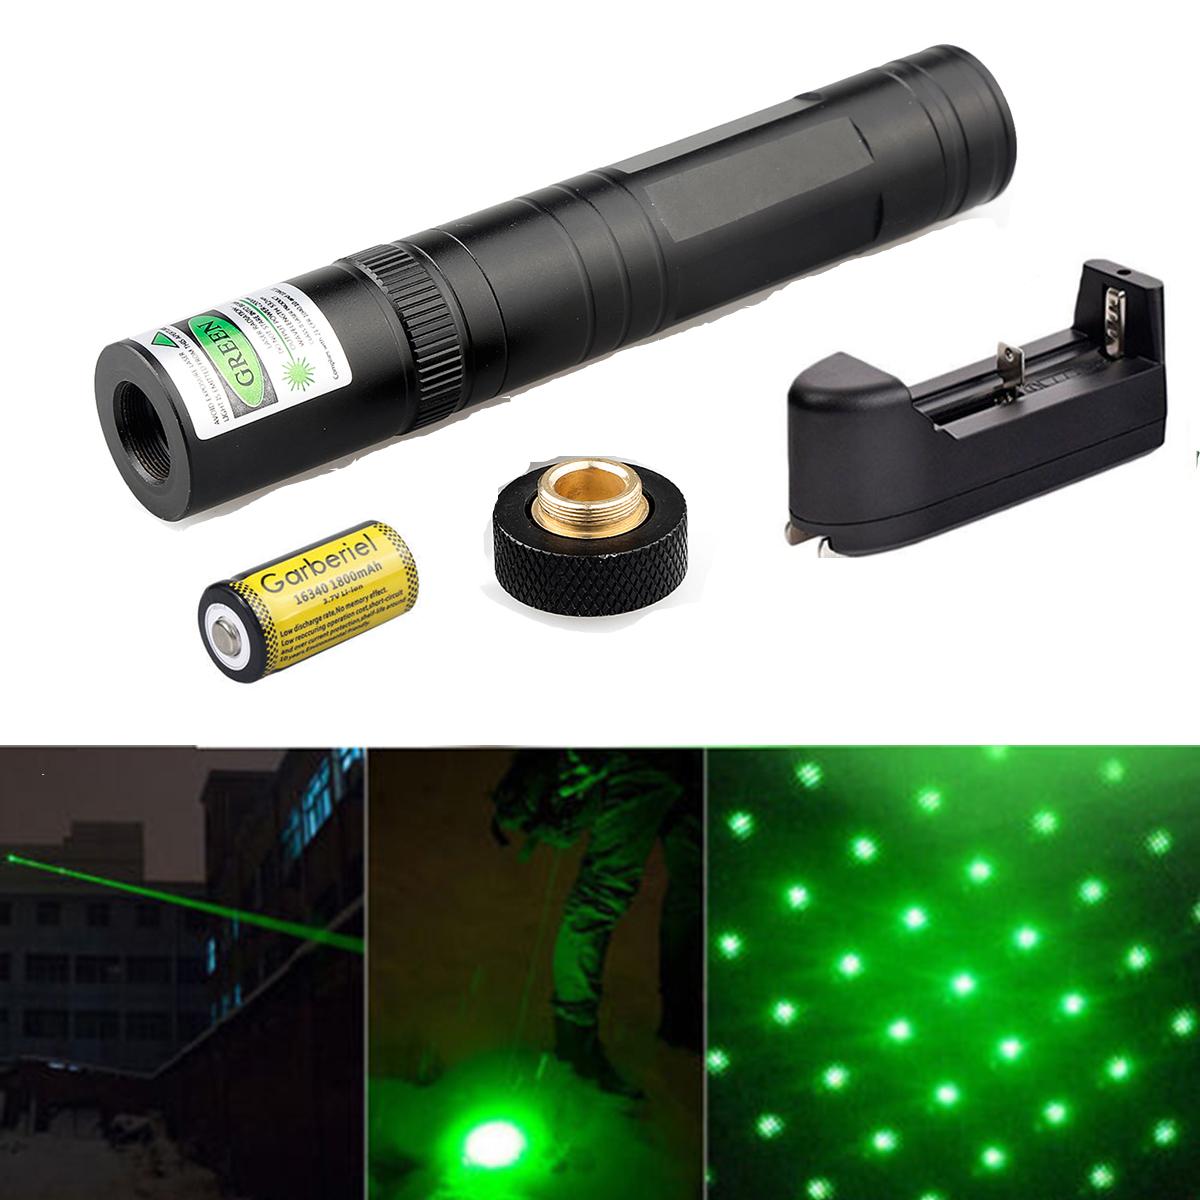 10Miles Green Visible Beam Light High Quality Teacher Pointer pen 16340&Charger